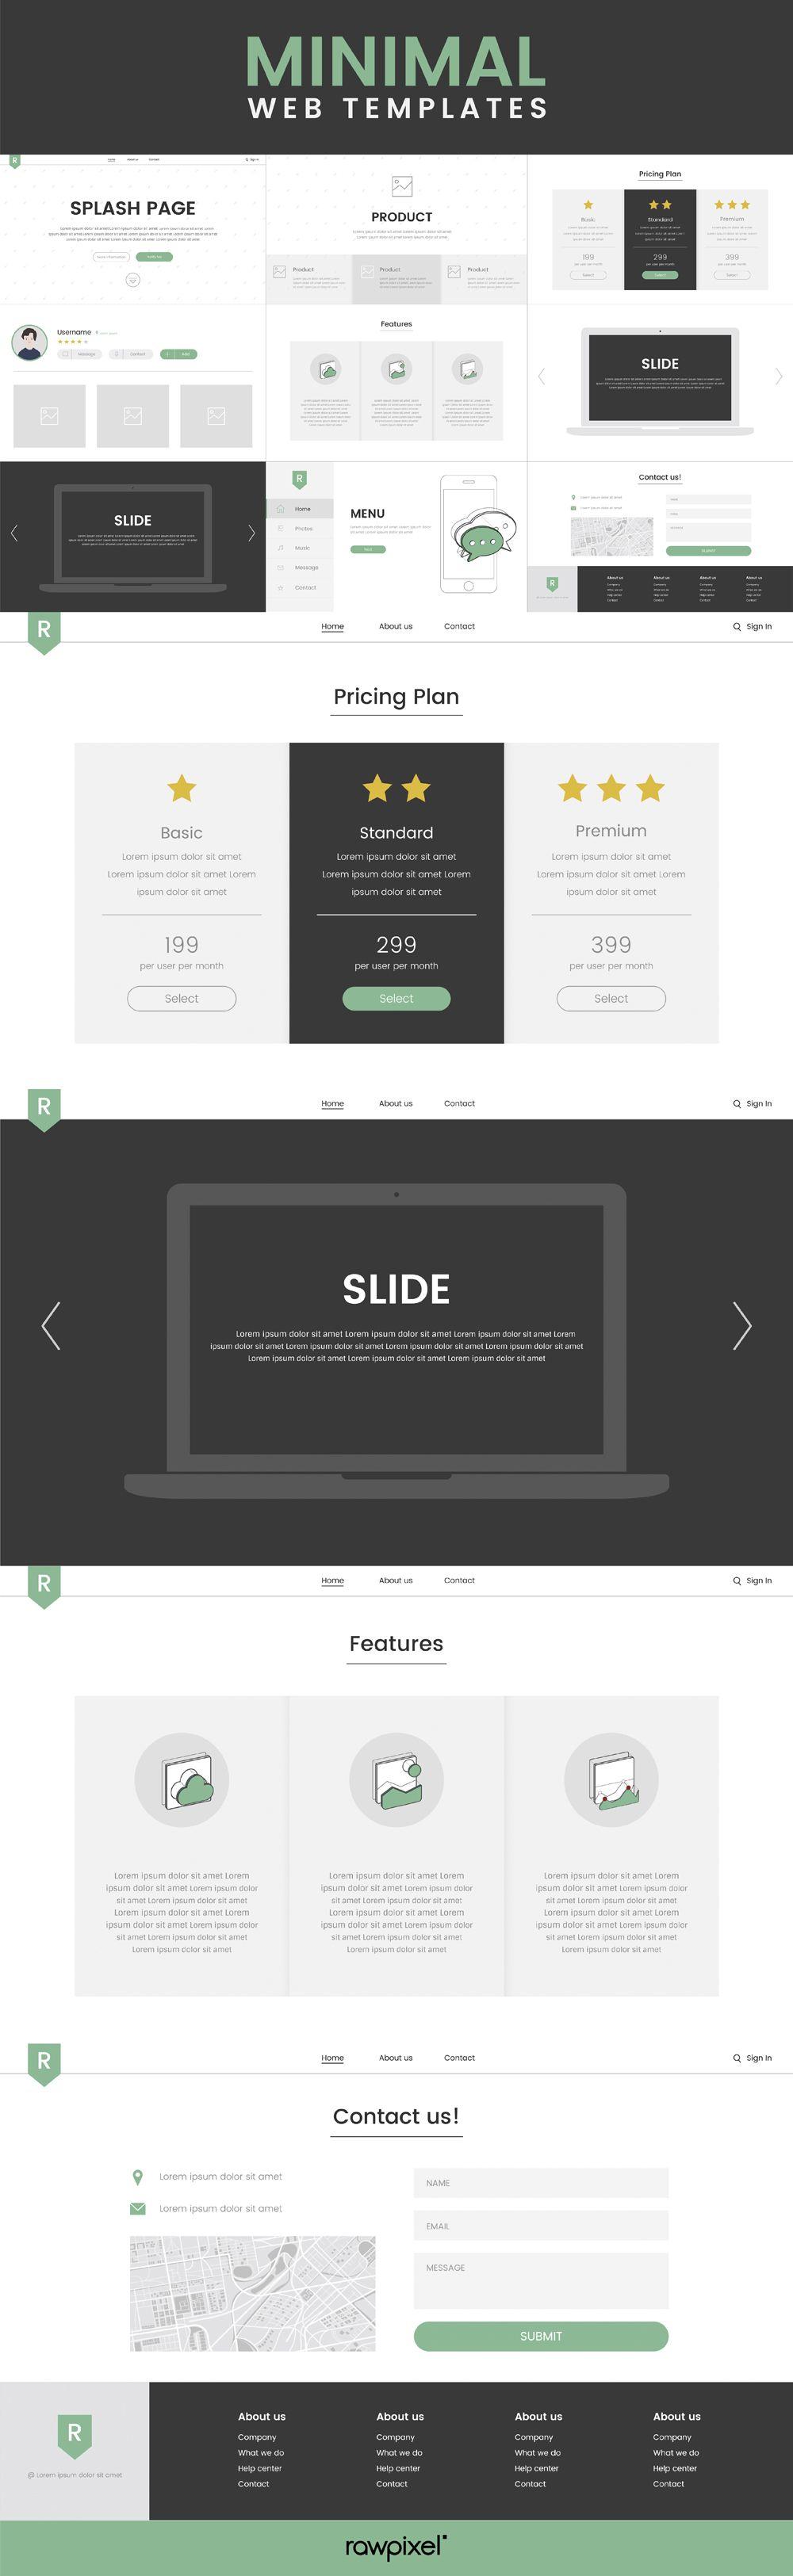 Download free beautiful royaltyfree minimal web templates